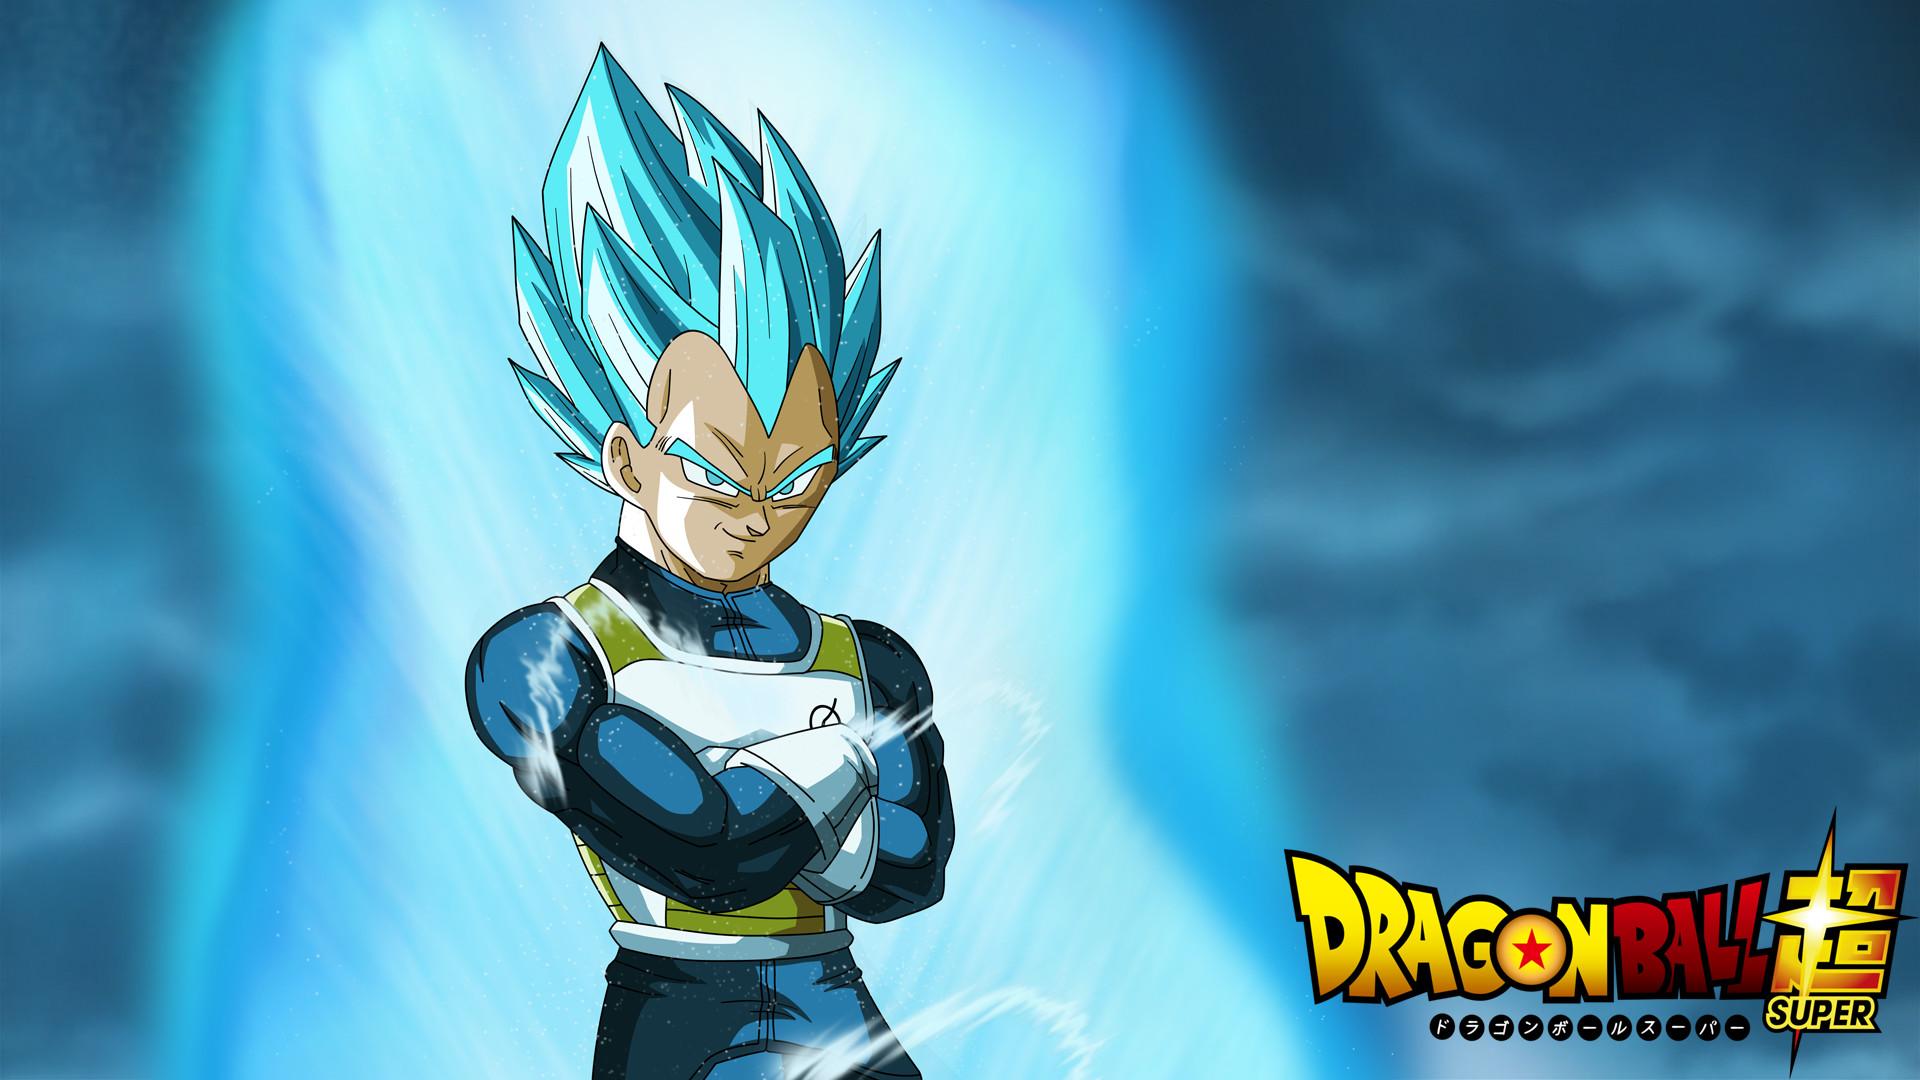 Dragon Ball Z Vegeta Wallpaper HD Resolution #DQhGF   Sukur.xyz